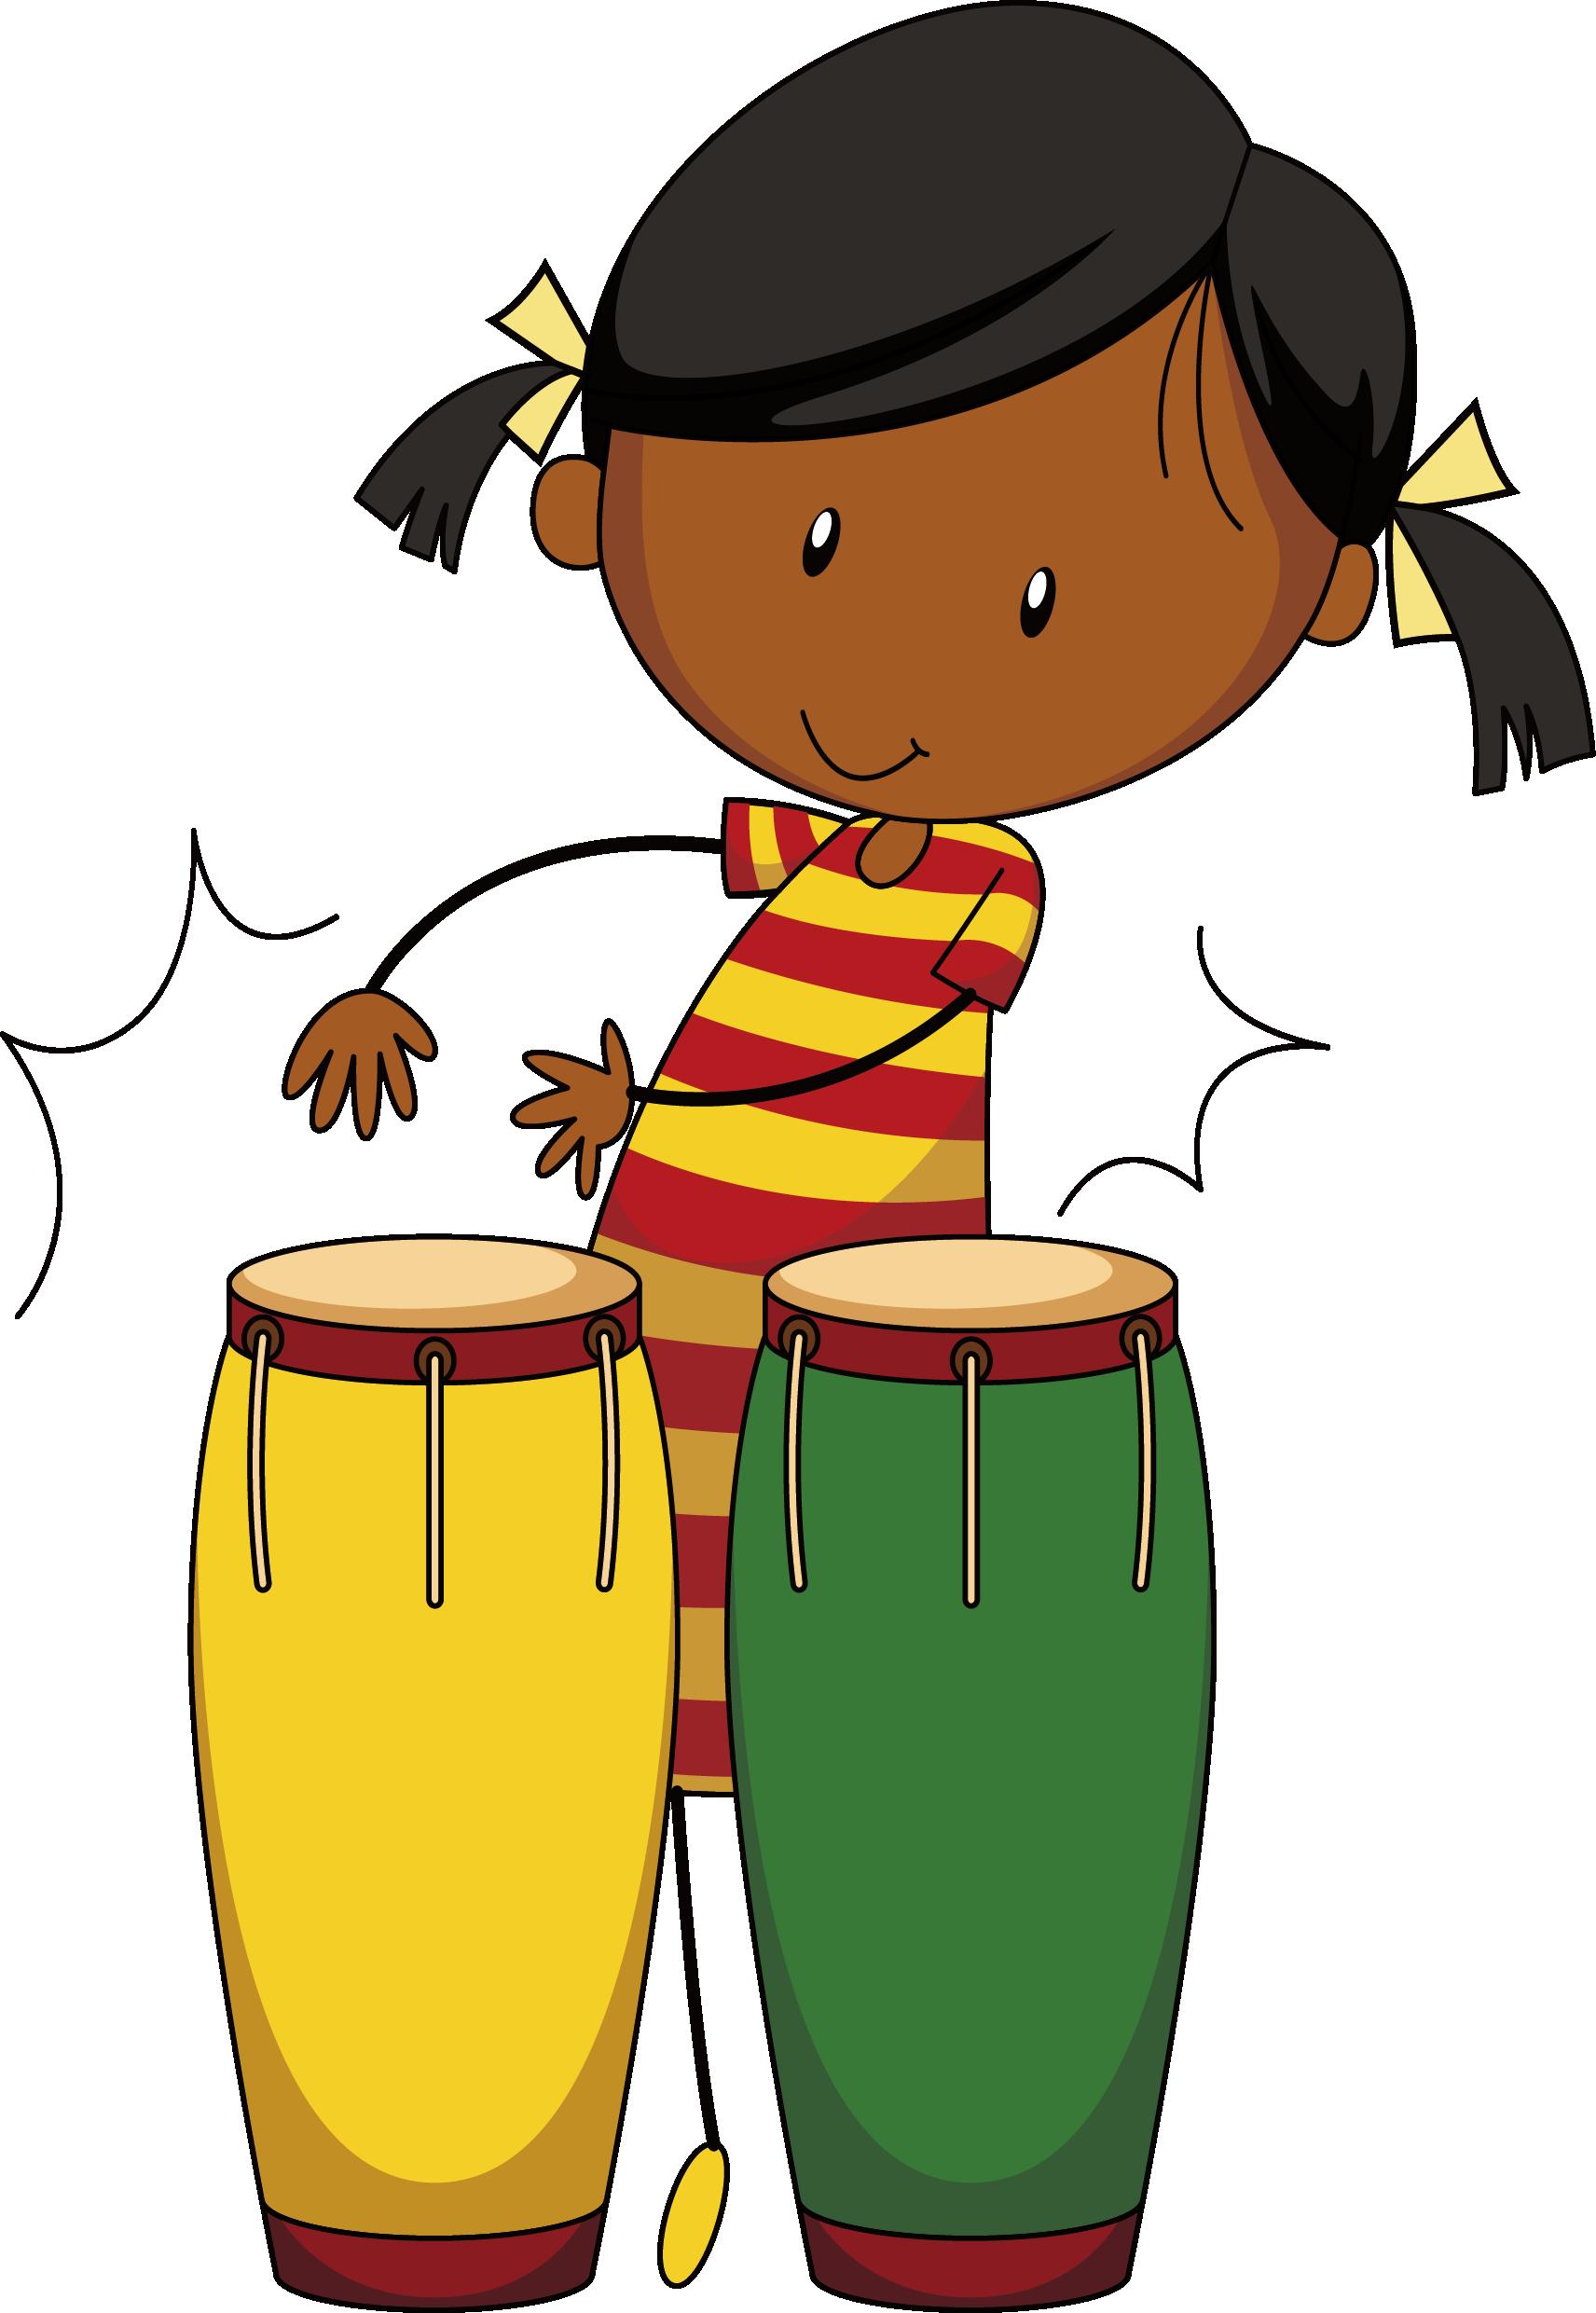 Drummer clip art african. Drums clipart drum beat